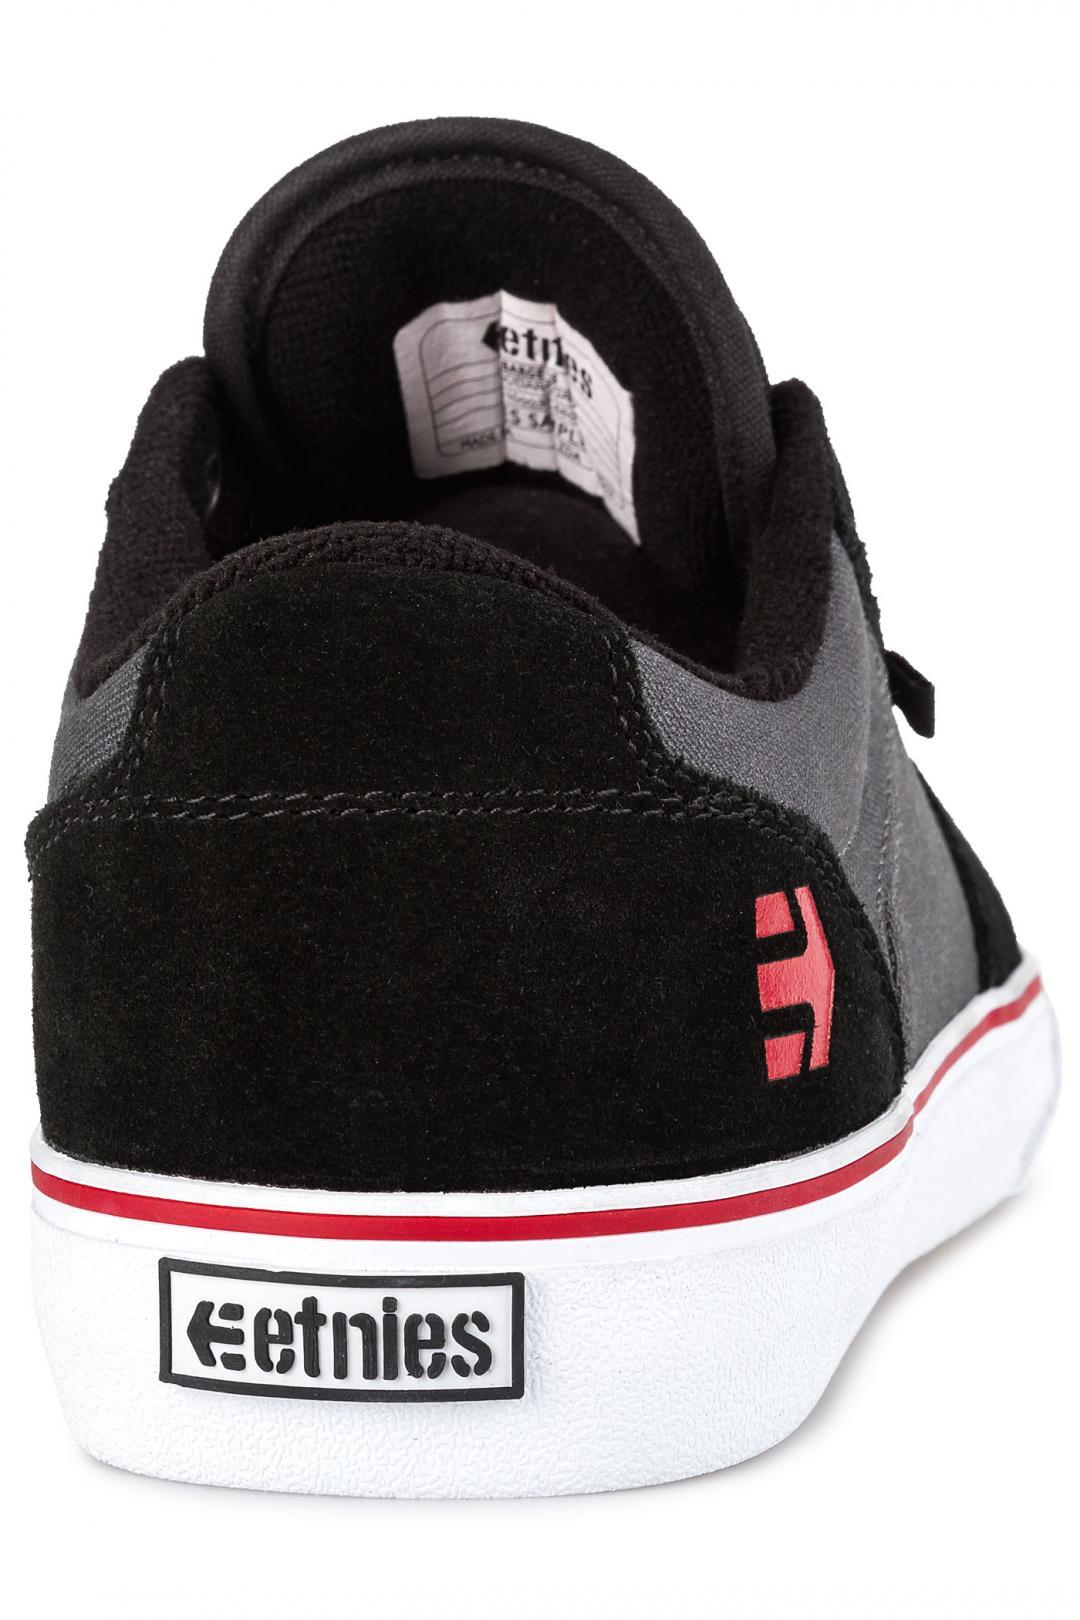 Uomo Etnies Barge LS black dark grey | Sneaker